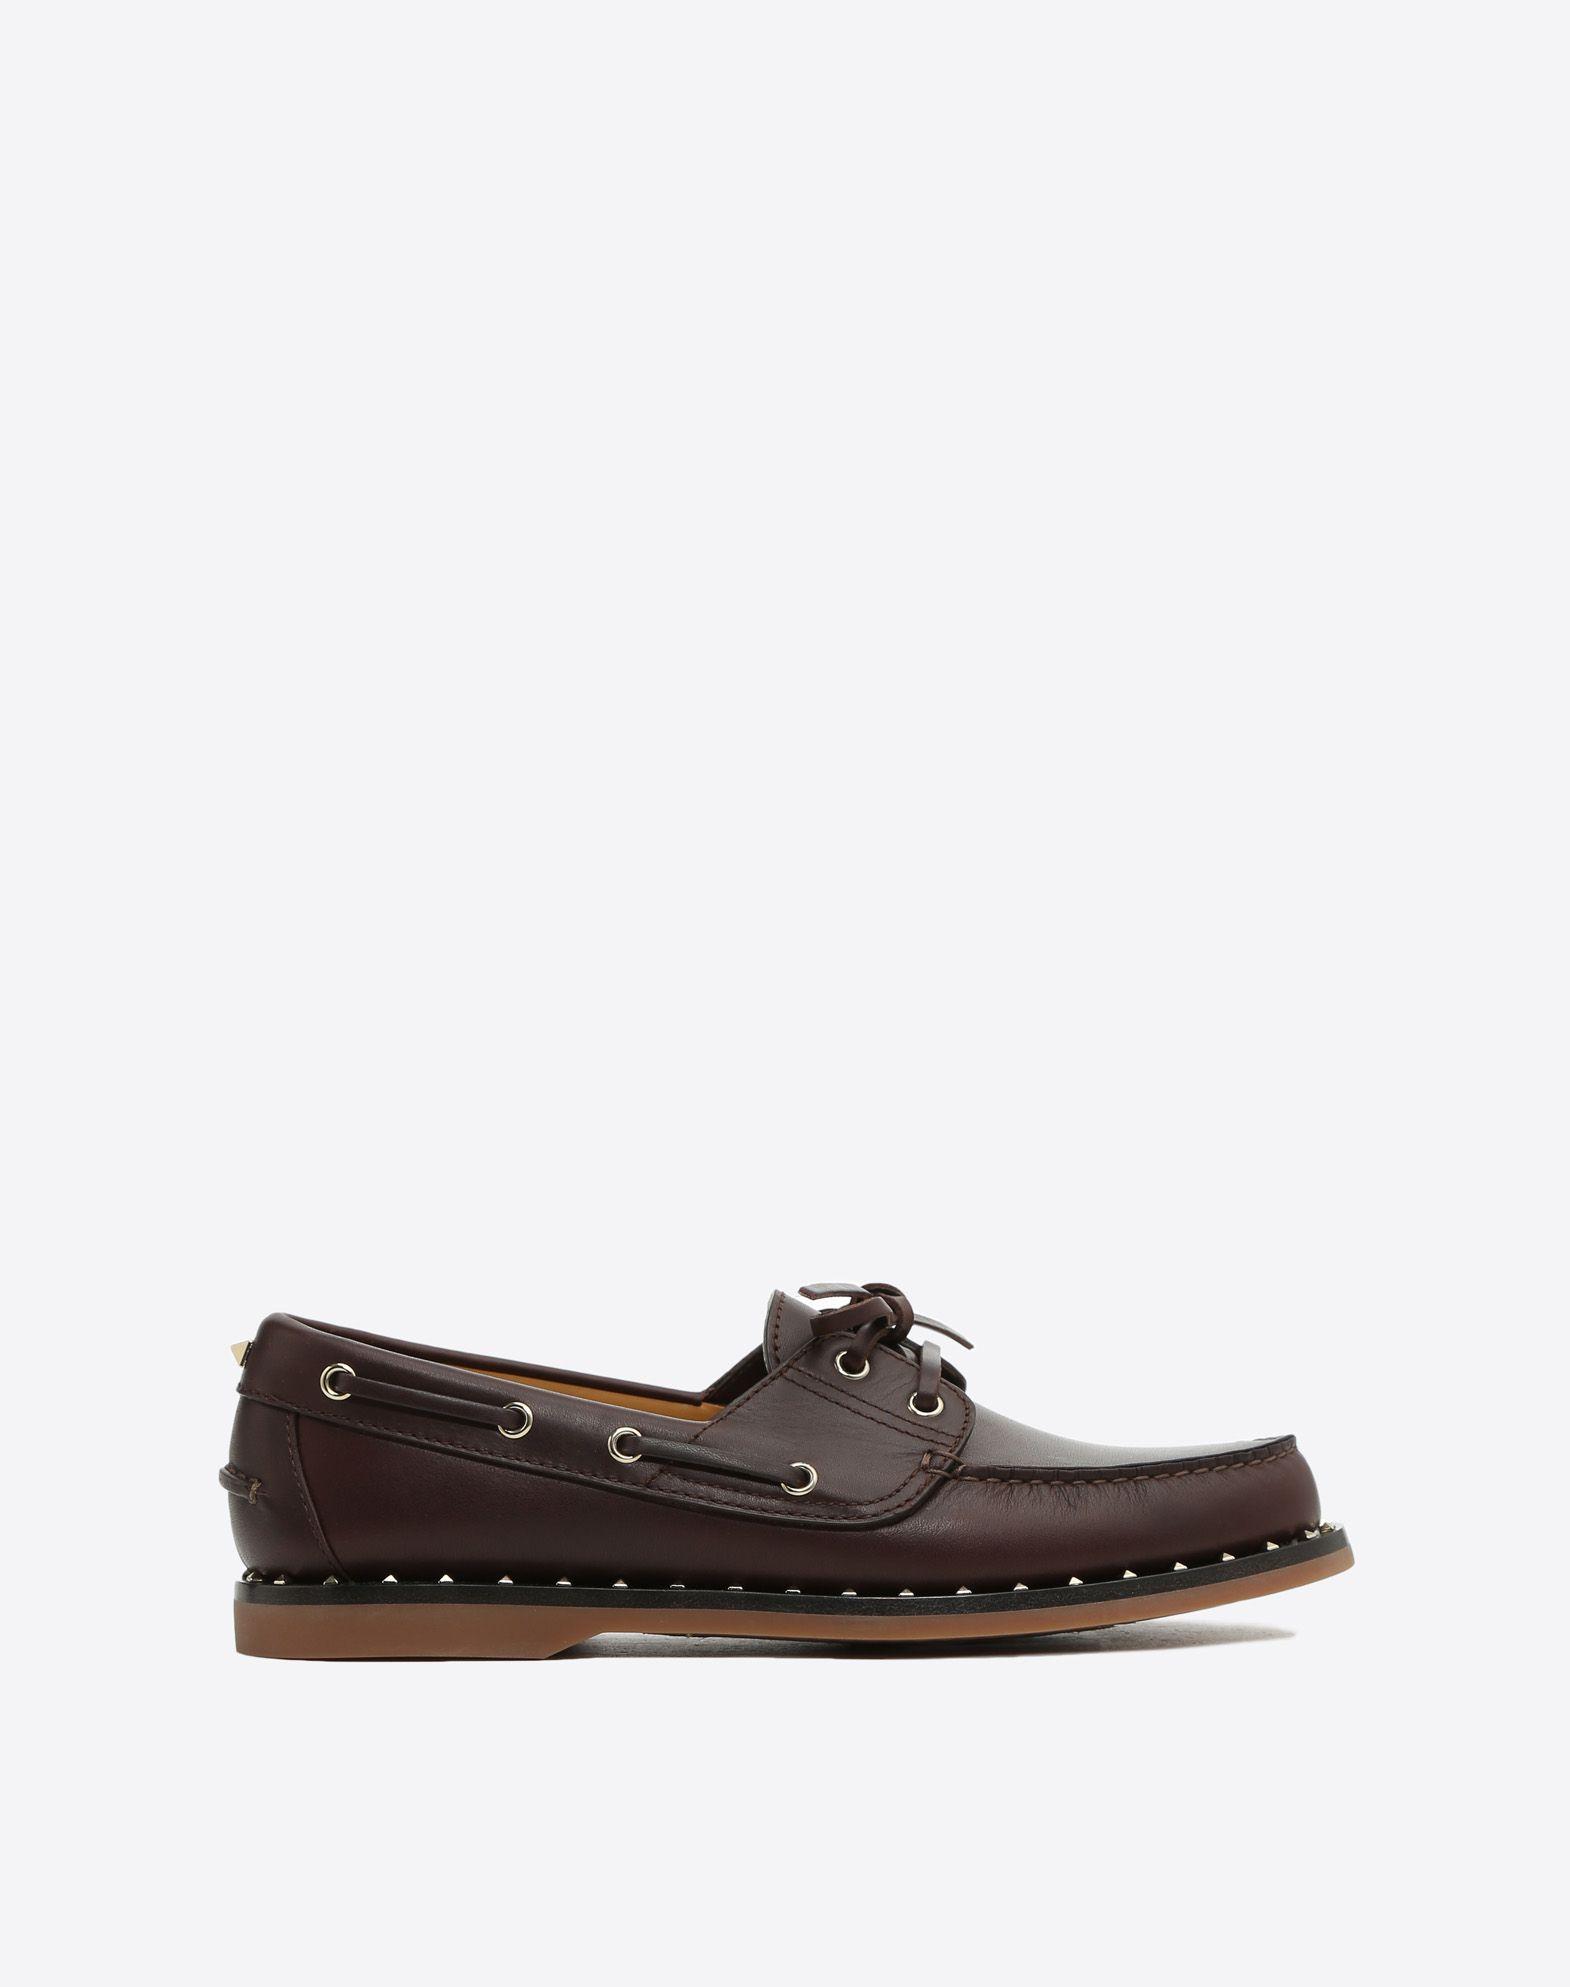 VALENTINO GARAVANI UOMO Soul Rockstud Boat shoes LOAFERS U f